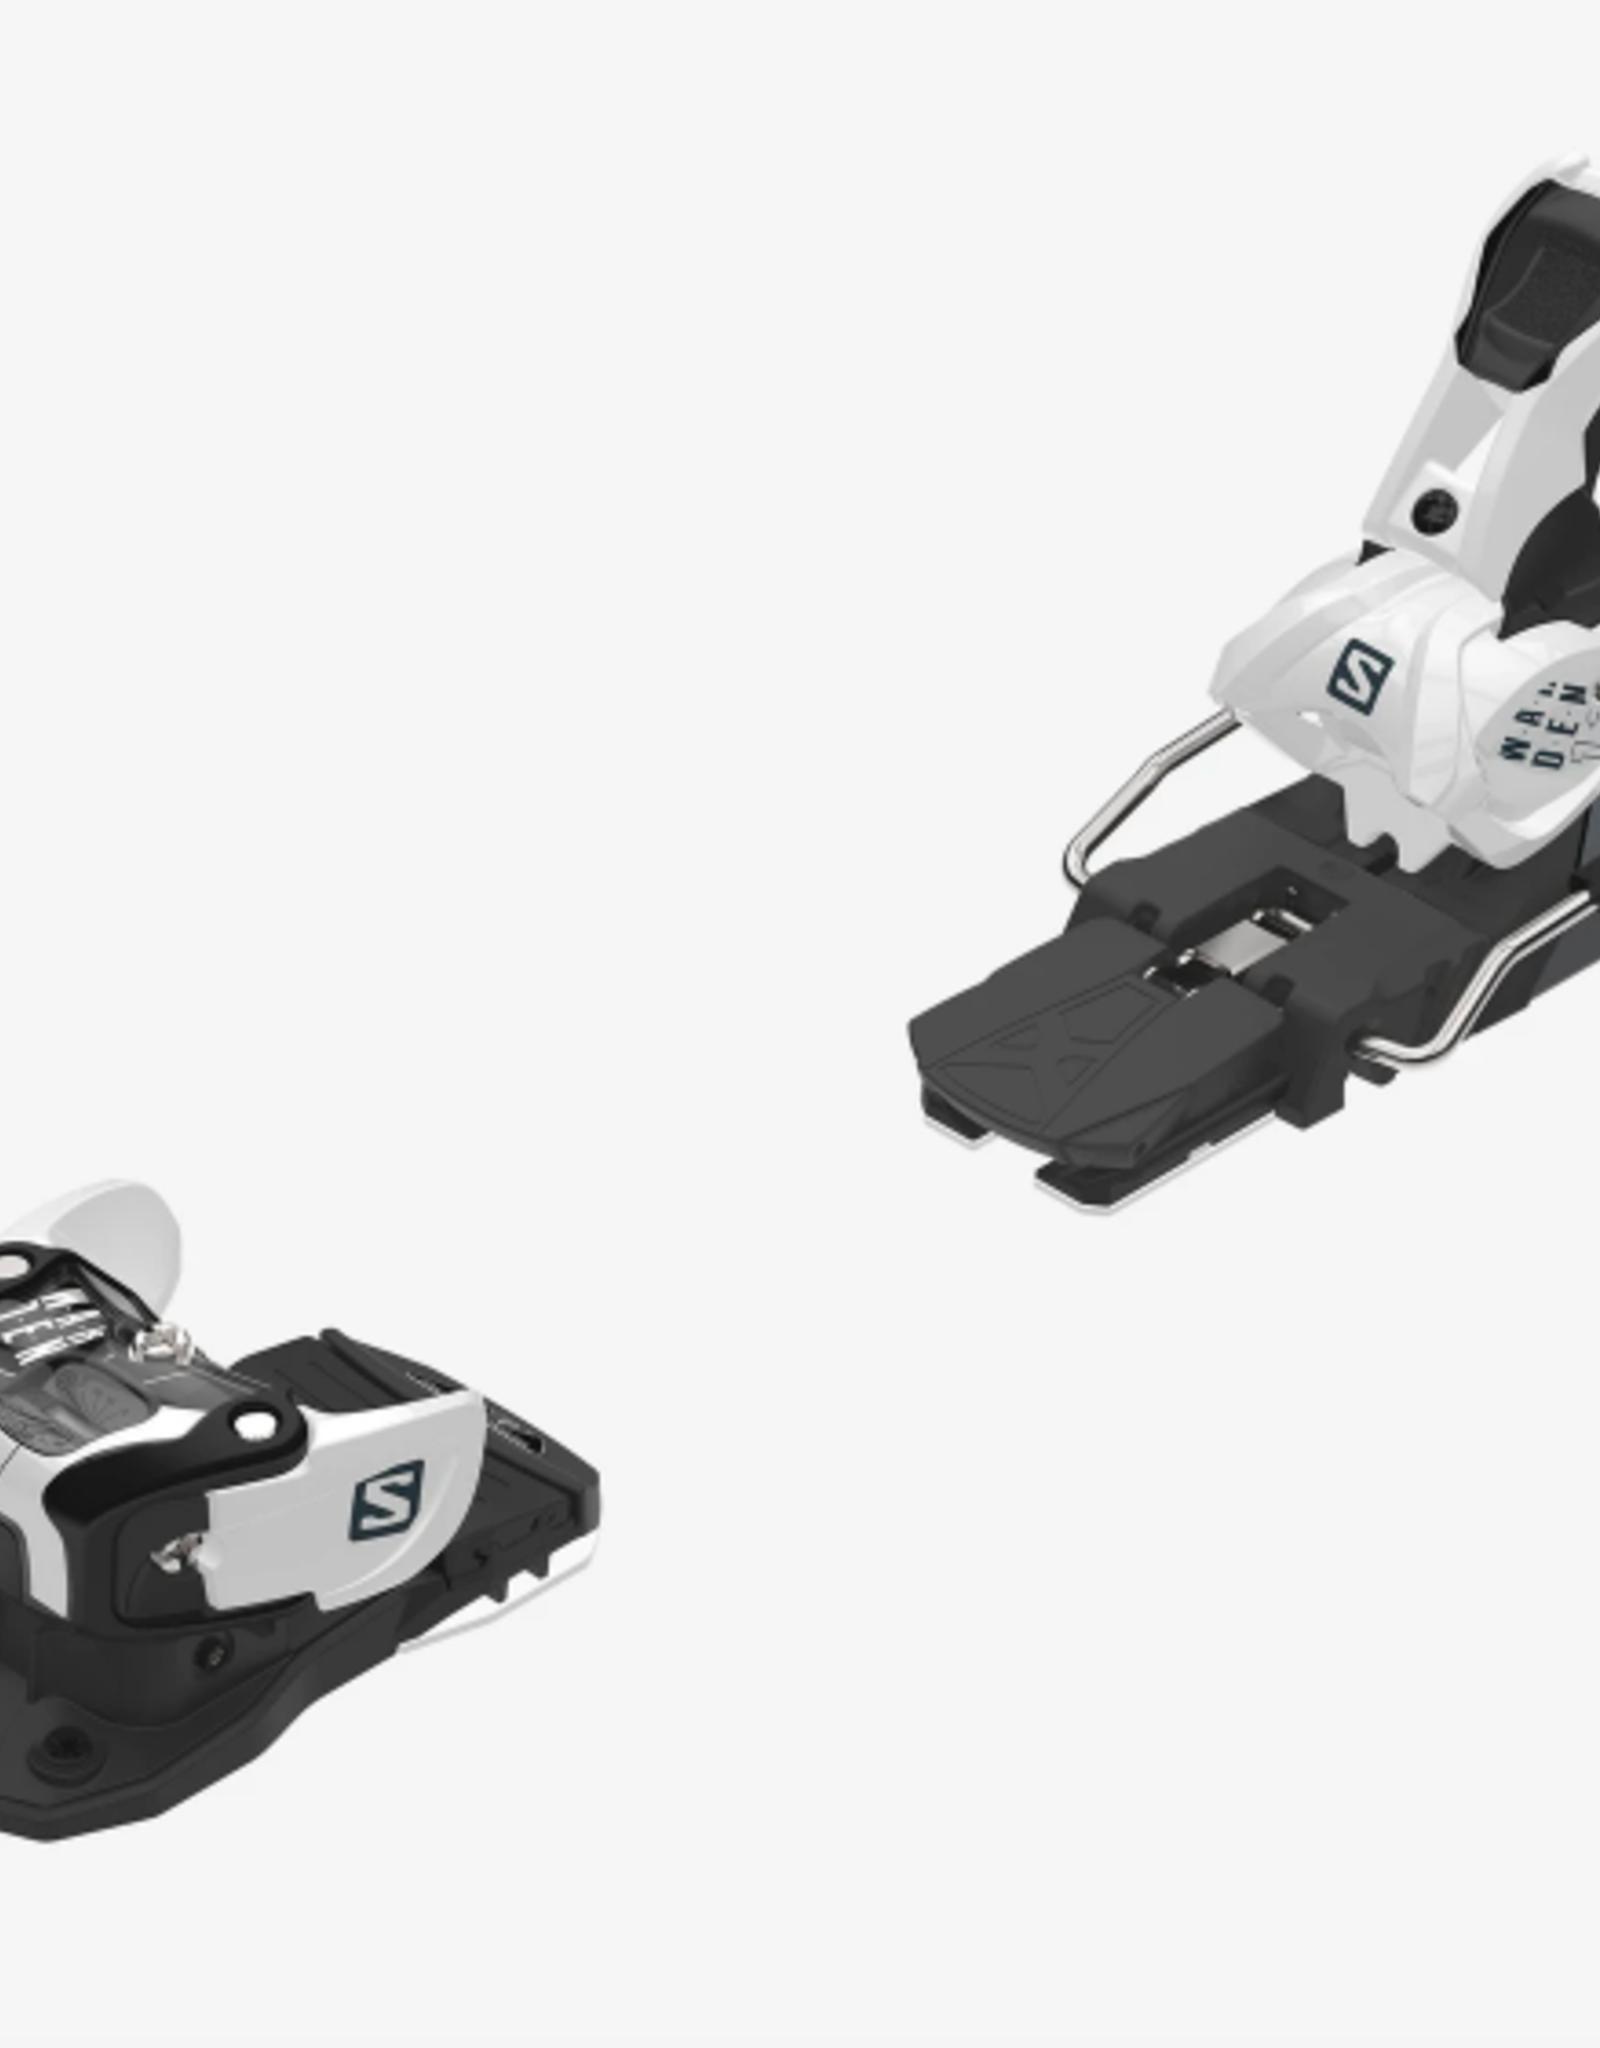 Salomon Warden MNC 13 Ski Bindings White/Black 2022